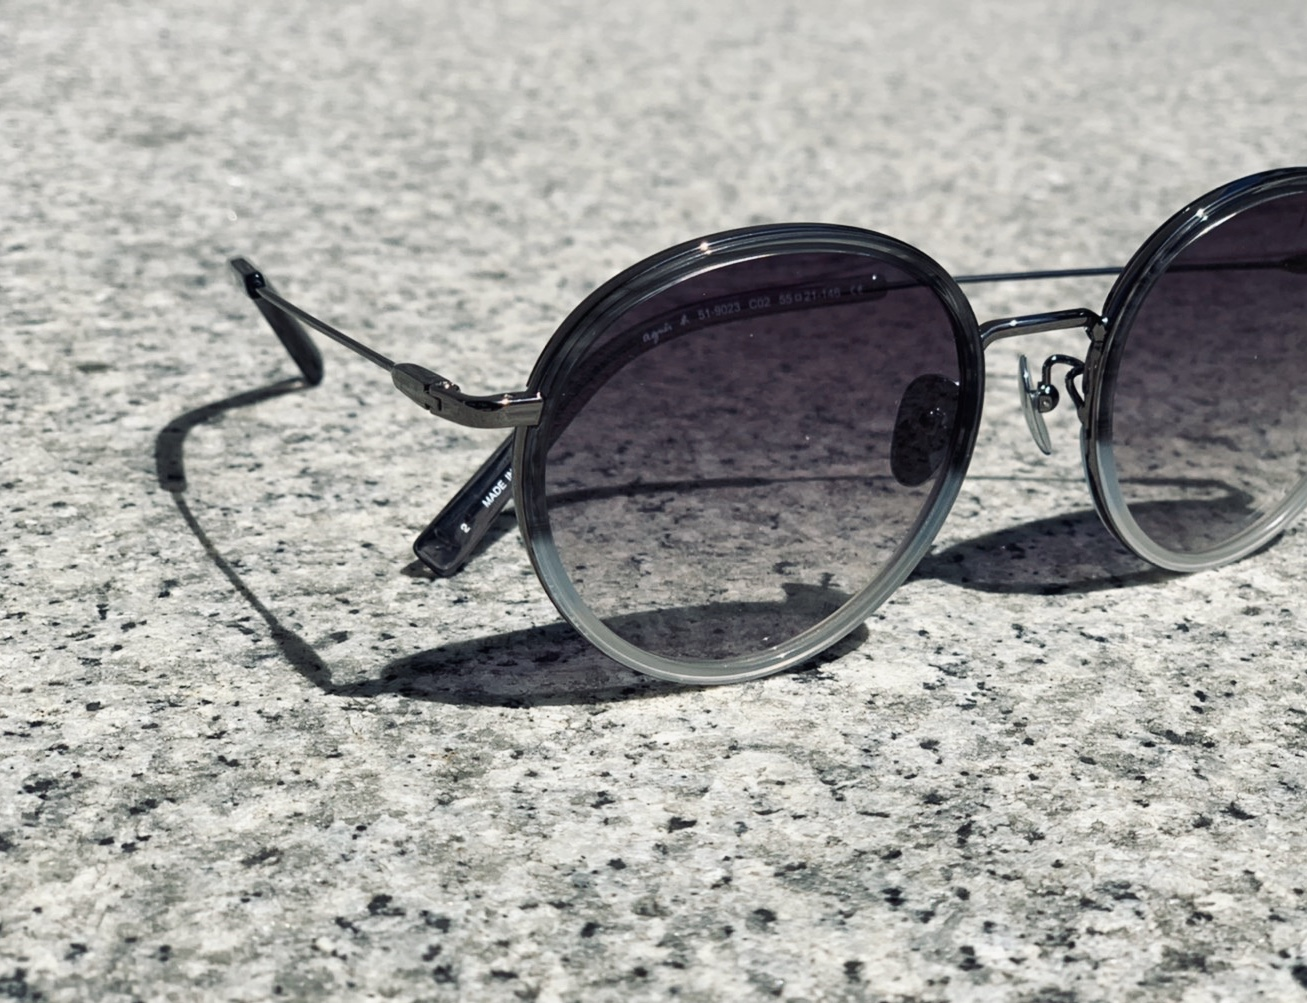 scrap book スクラップブック sunglasses サングラス MARC JACOBS マークジェイコブズ アニエスベー agnes b.